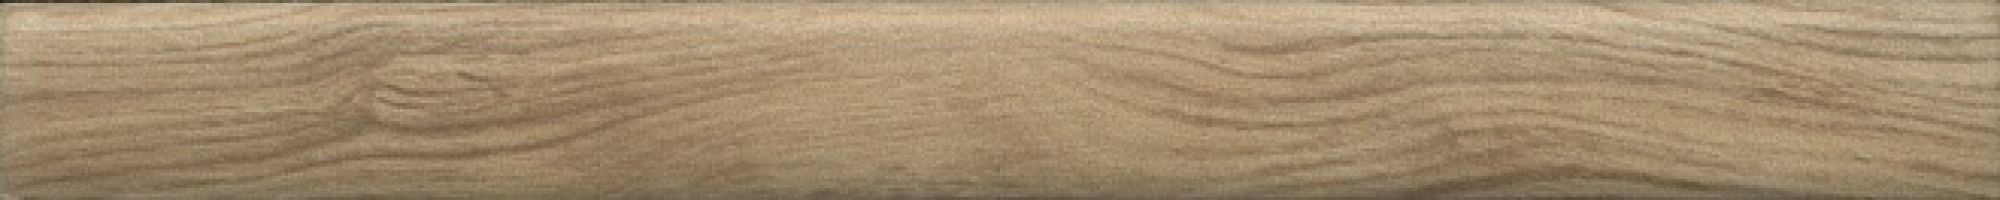 Бордюр Карандаш Муза PFE0170 2x20 Kerama Marazzi